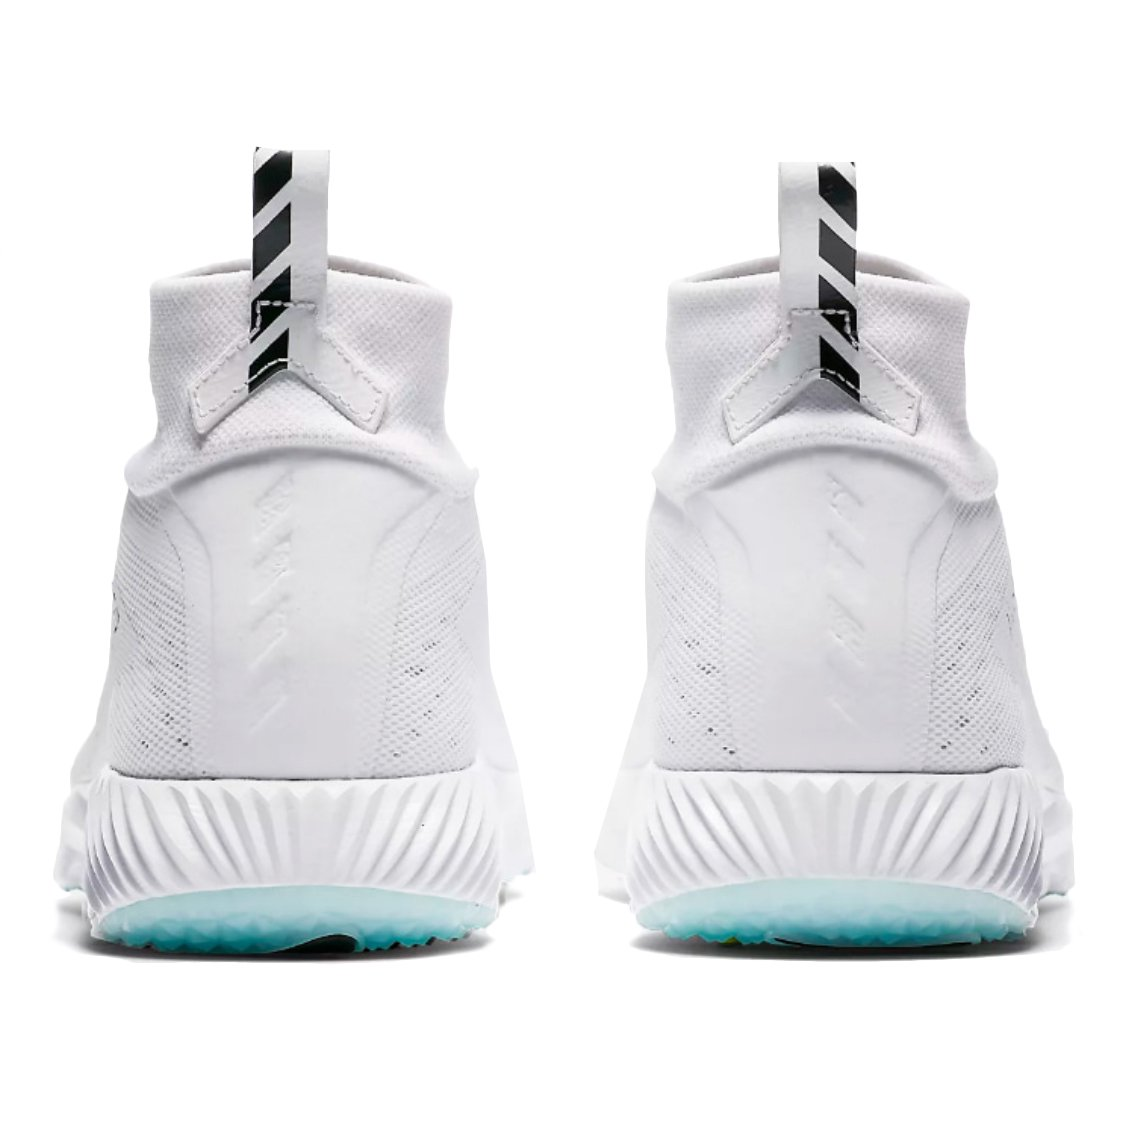 6135552d0d Amazon.com | Nike Vapor Untouchable Speed Turf 2 Mens 917169-100 Size 18  White/Black | Football